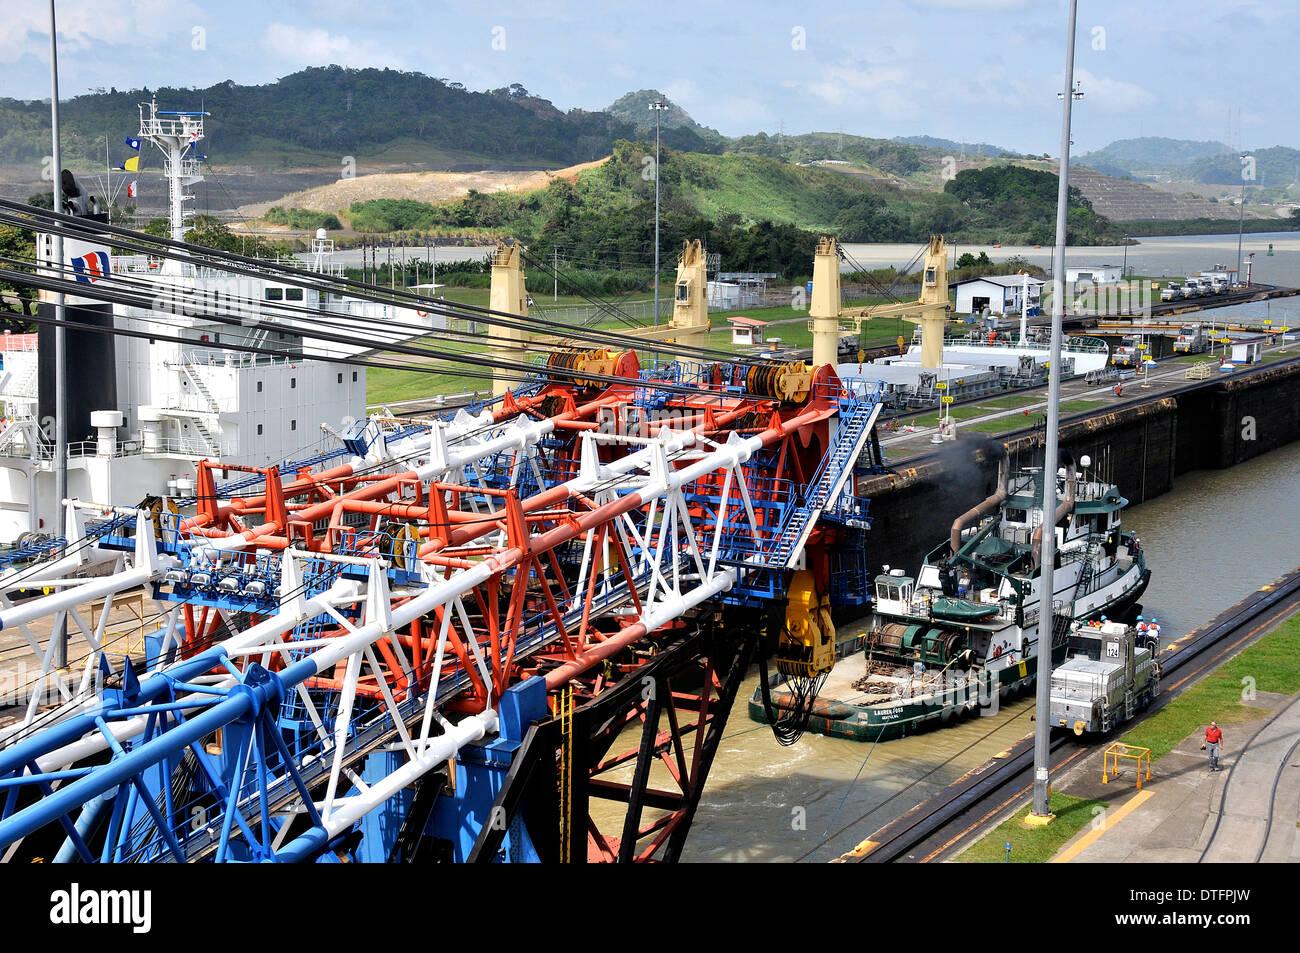 Left Coast Lifter the giant floating crane of 'American Bridge Fluor' in Panama canal Miraflores locks Panama - Stock Image